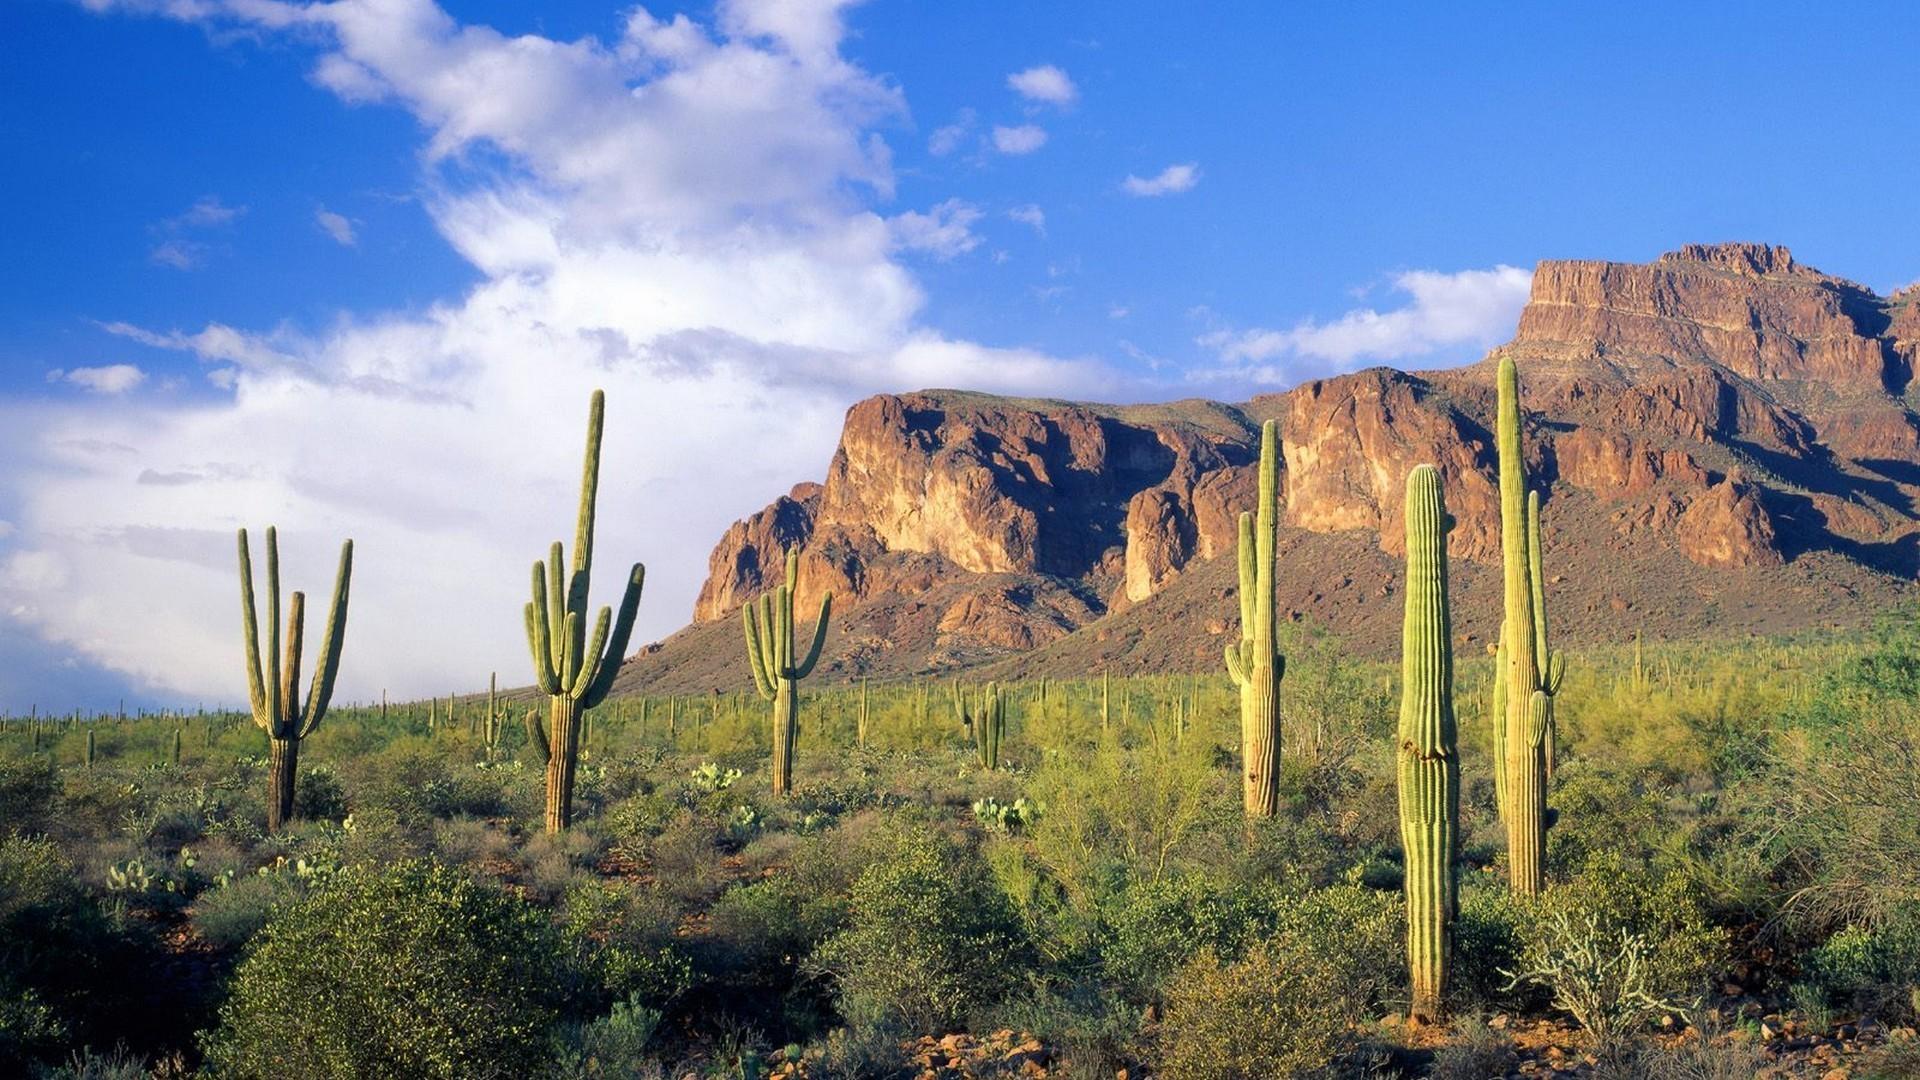 landscapes forests Arizona national cactus Tonto wallpaper background .